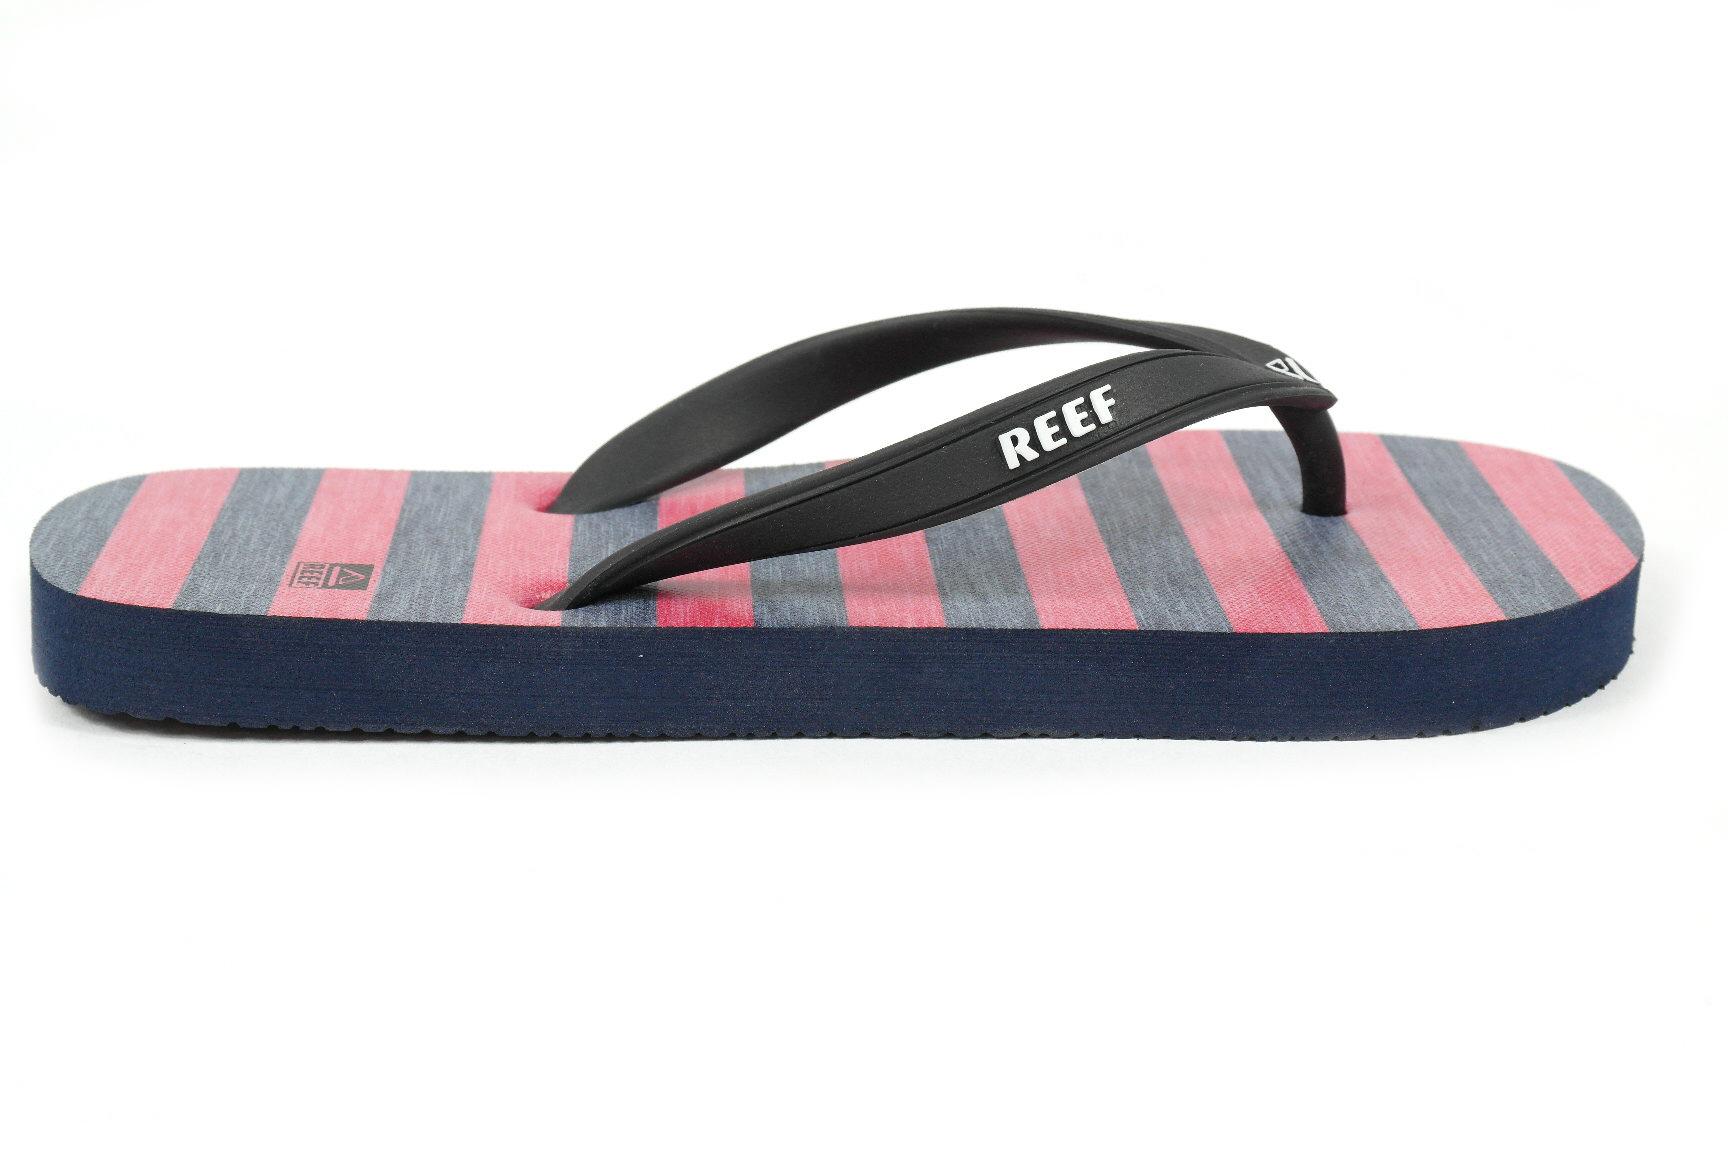 c4c744d1bccbe4 Reef Grom SwitchfootPrint jongens slippers denim van slippers & sandalen